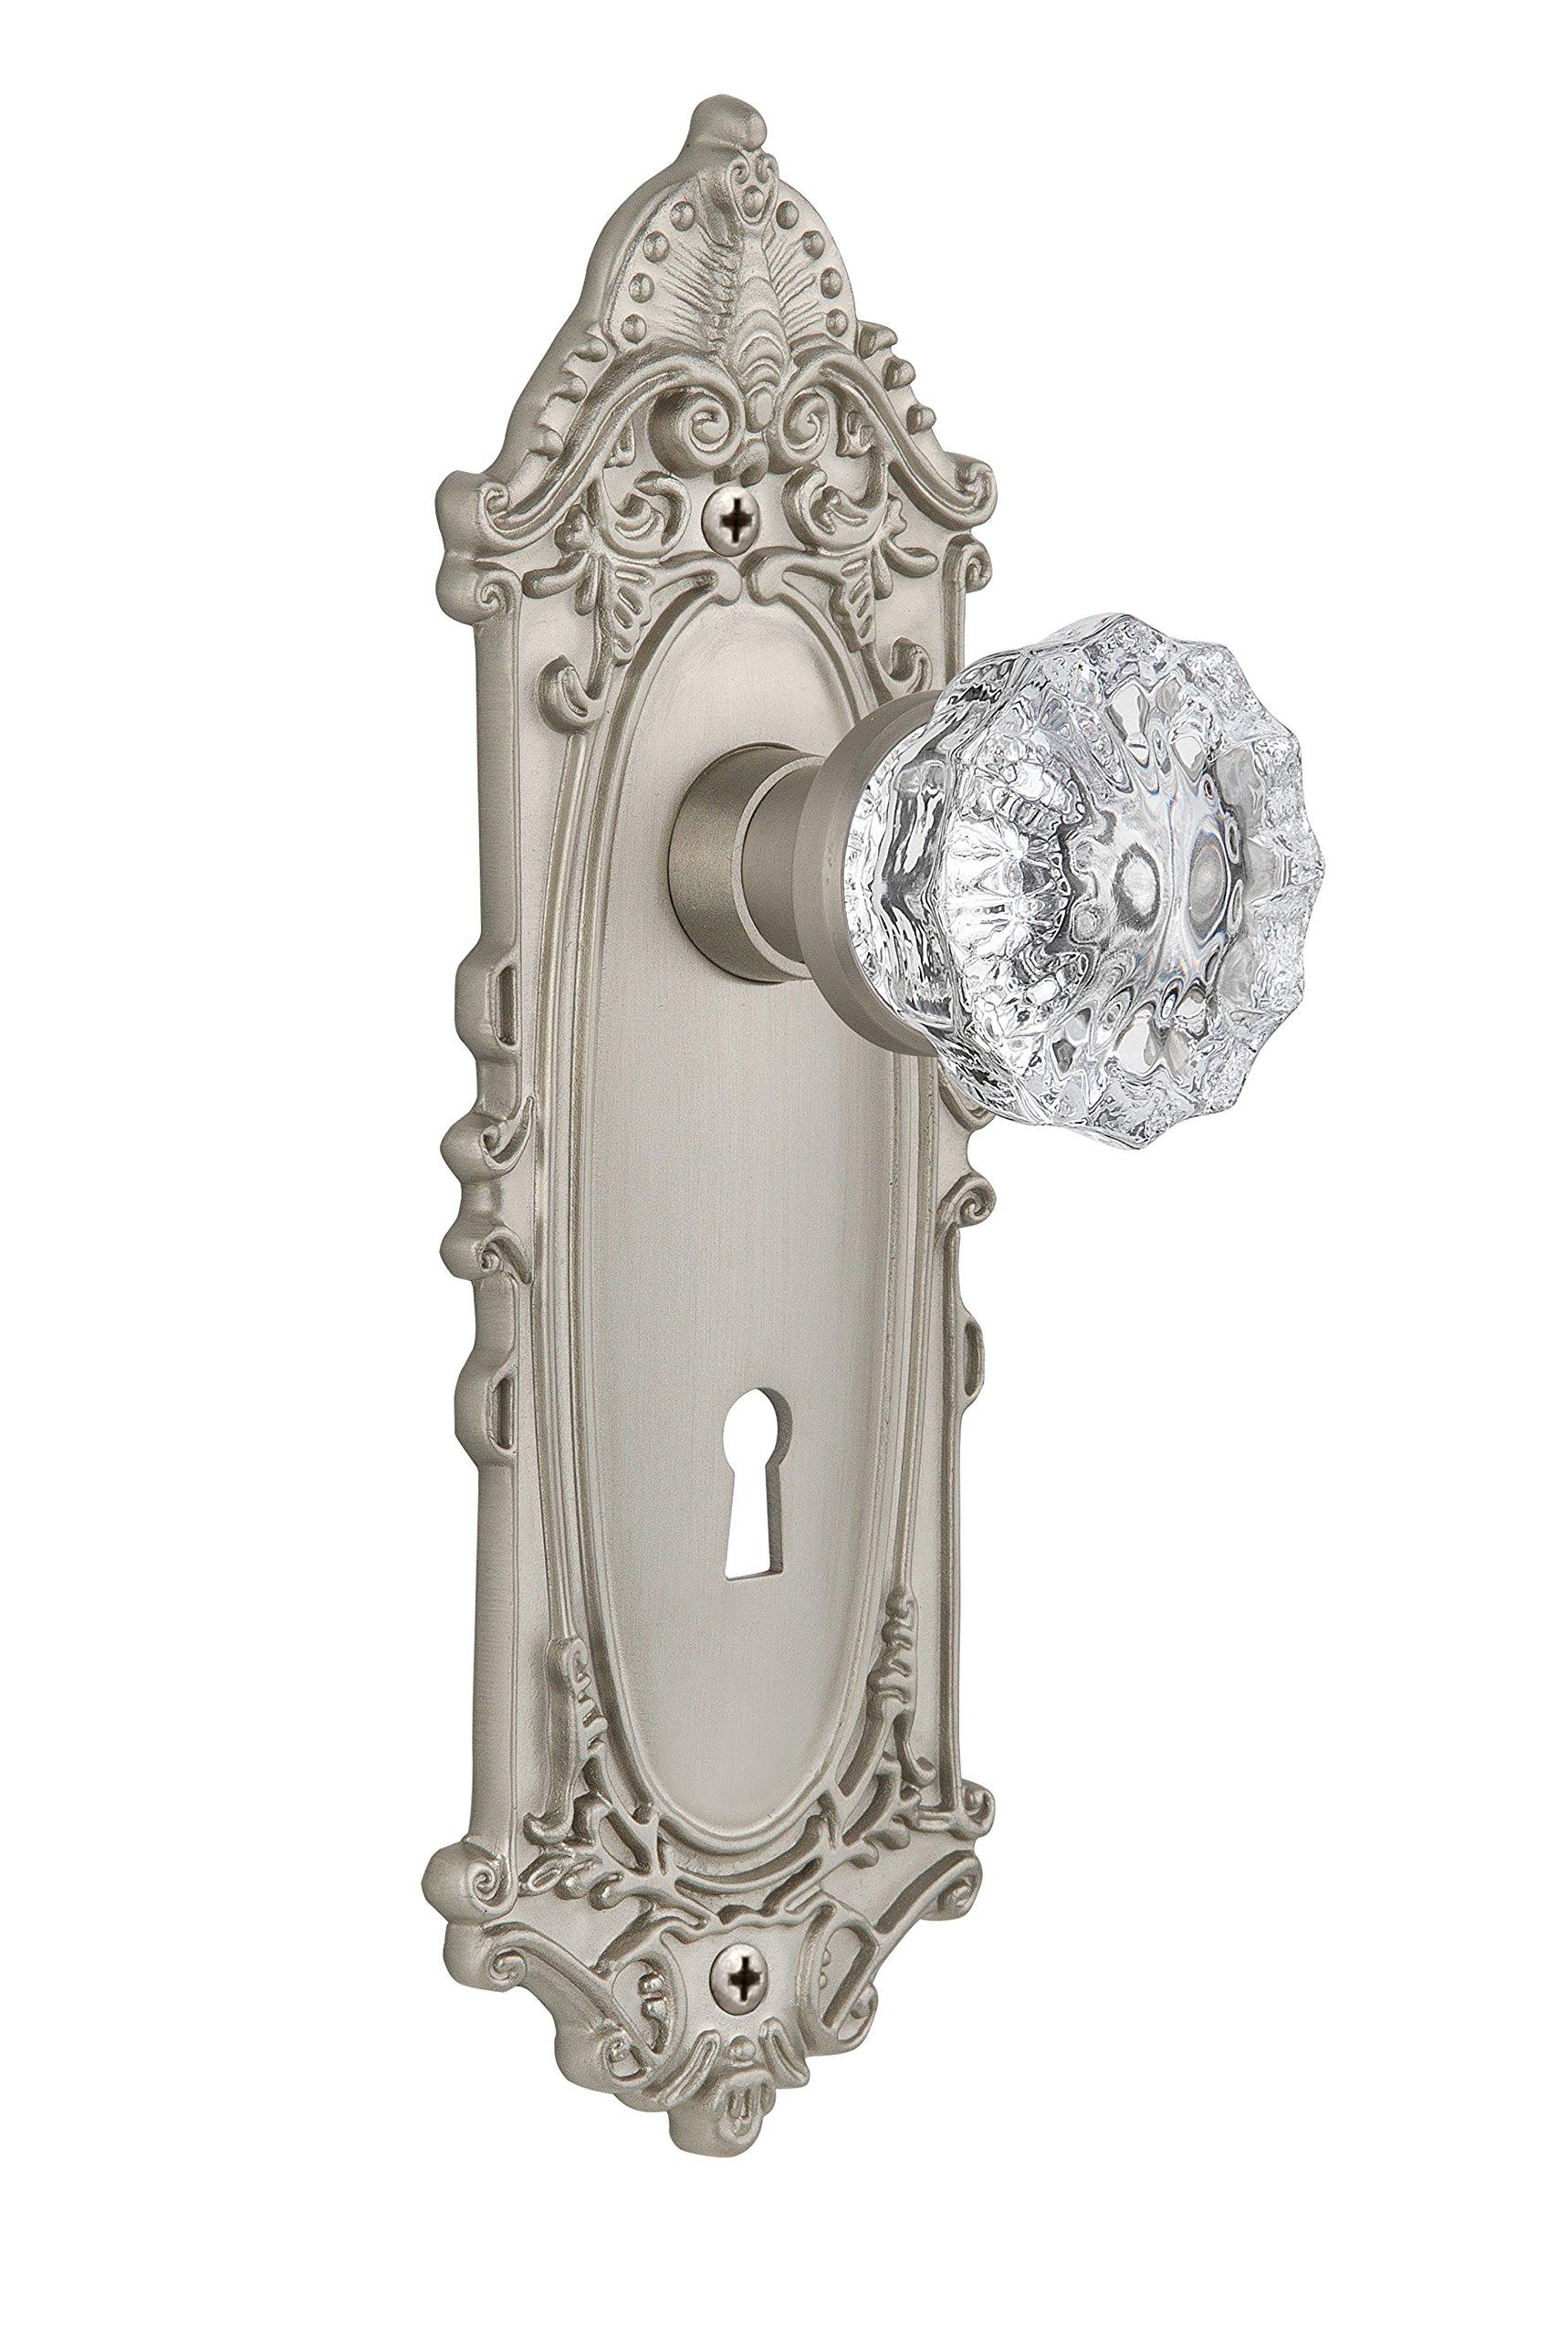 Nostalgic Warehouse Victorian Plate with Keyhole Crystal Glass Knob, Single Dummy, Satin Nickel